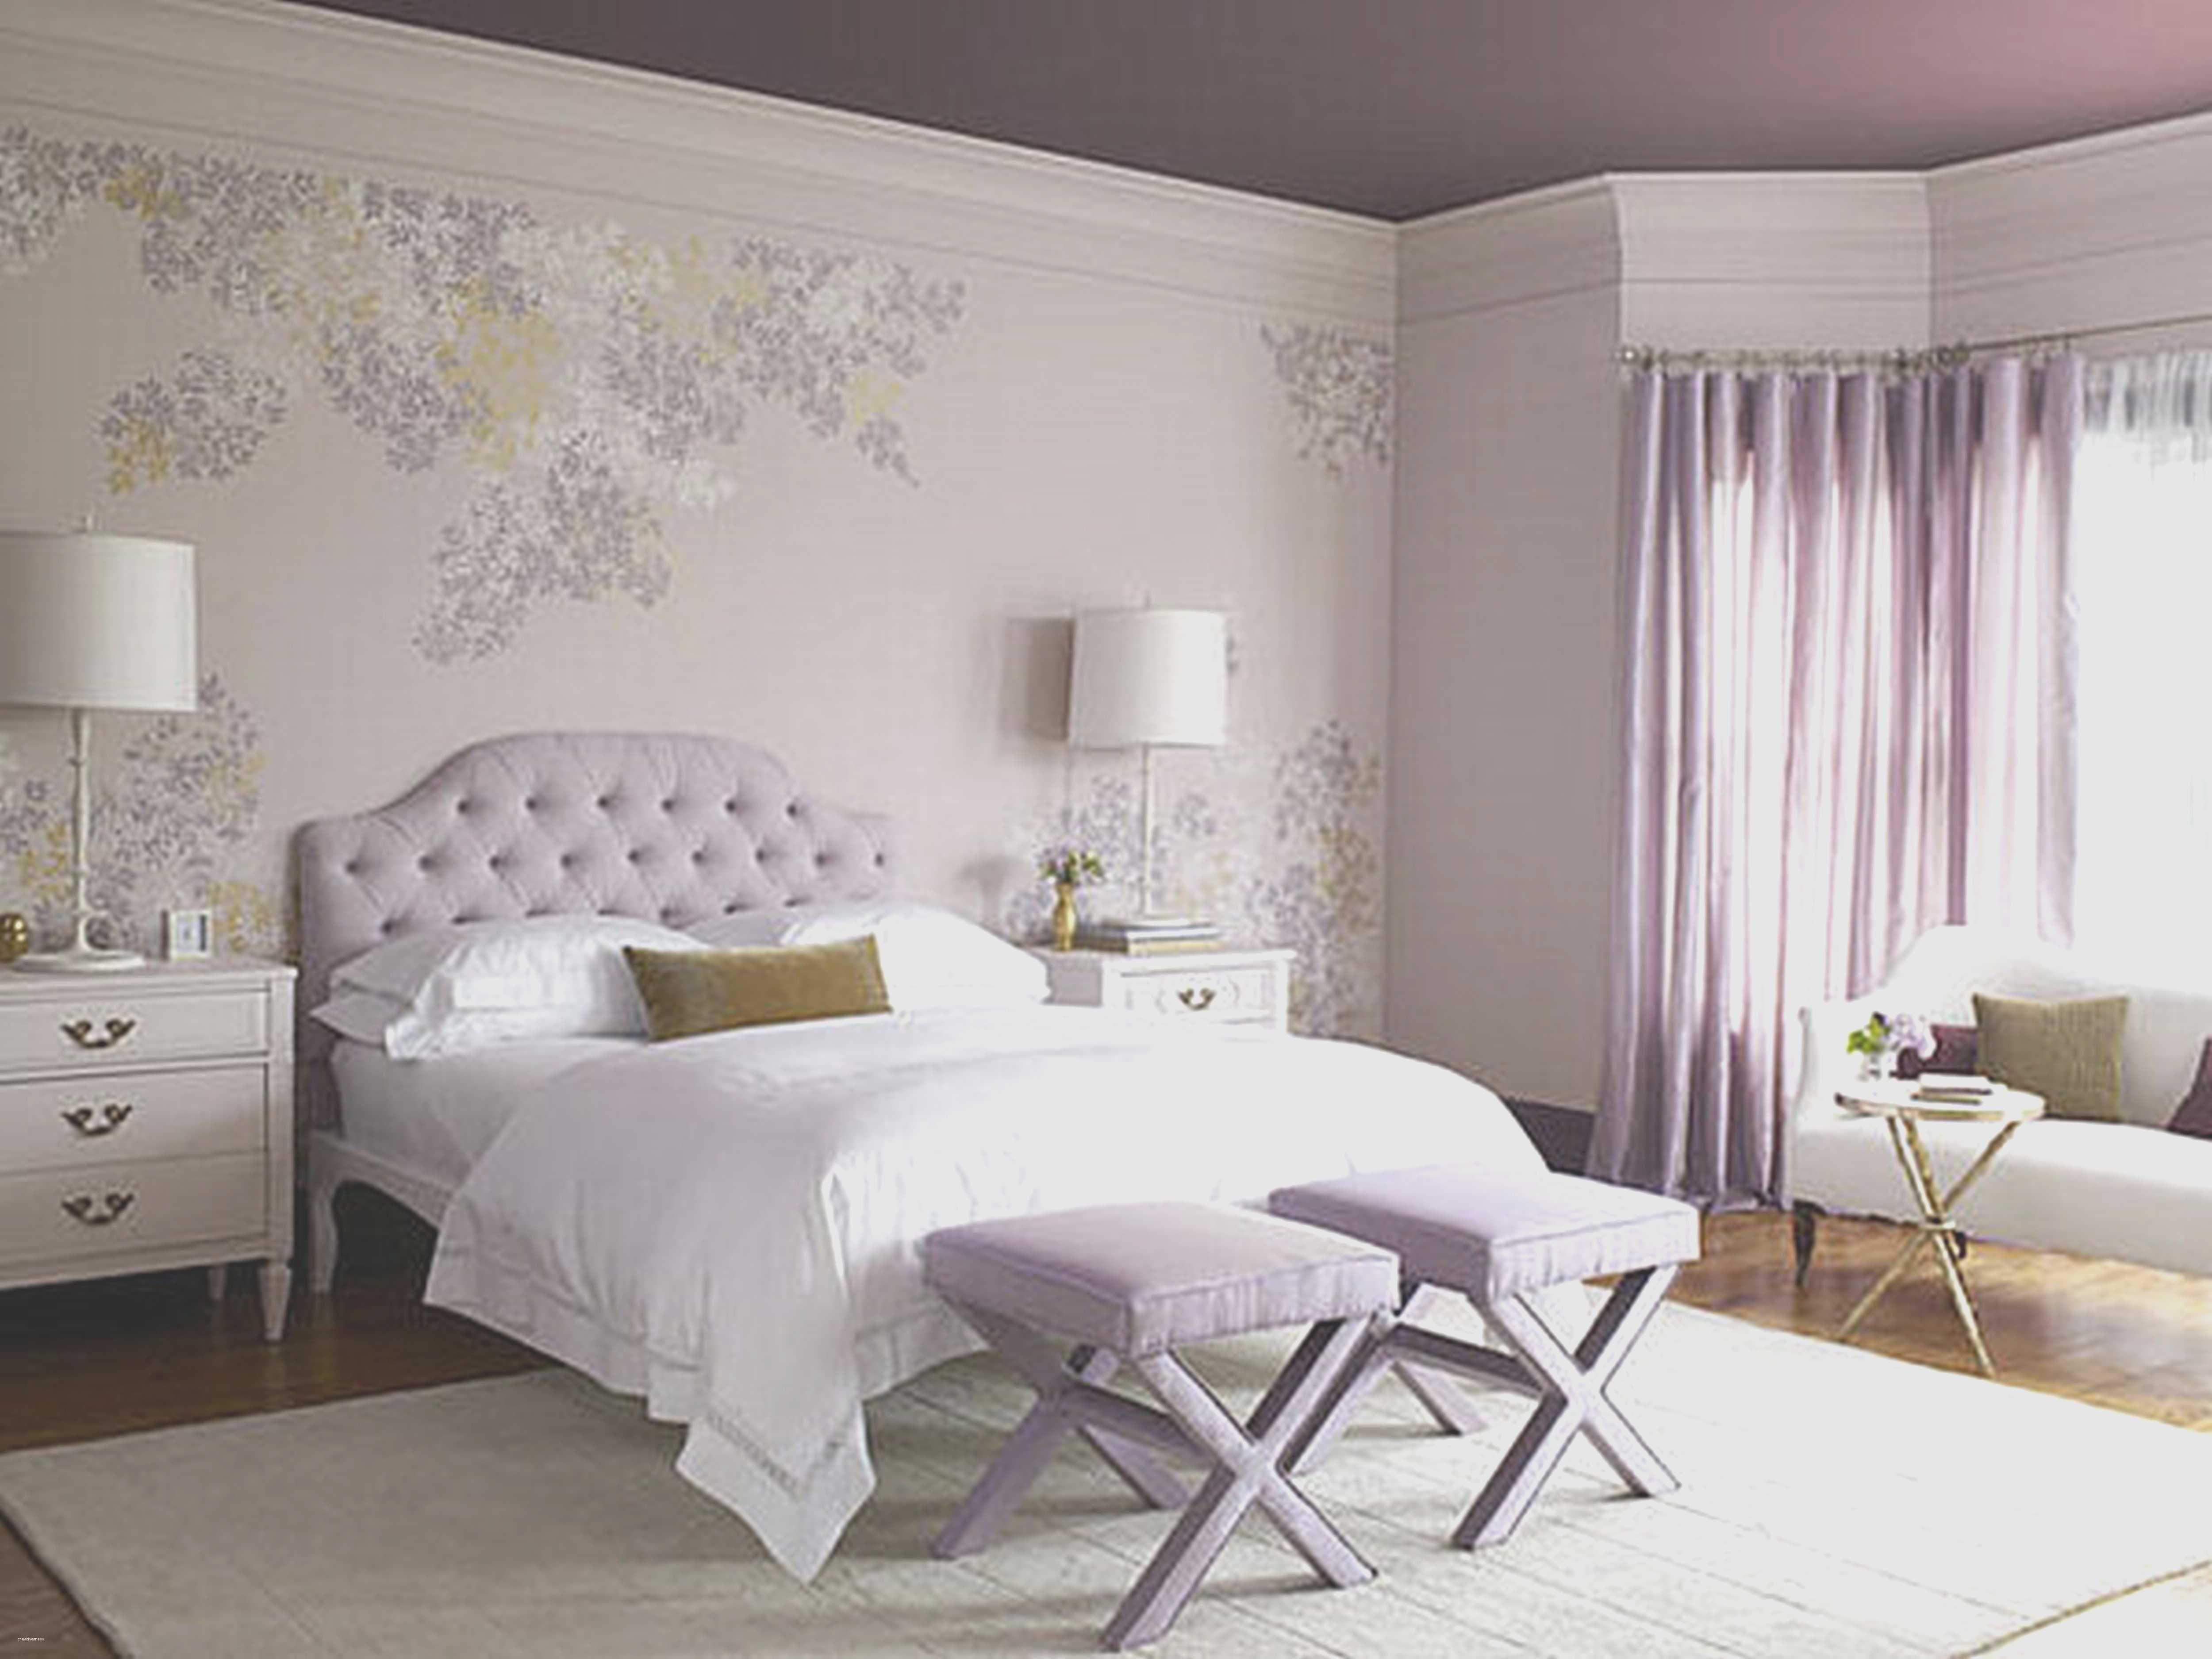 Bedroom Ideas for Teenage Girls Pinterest - Best Of ... on Classy Teenage Room Decor  id=85834